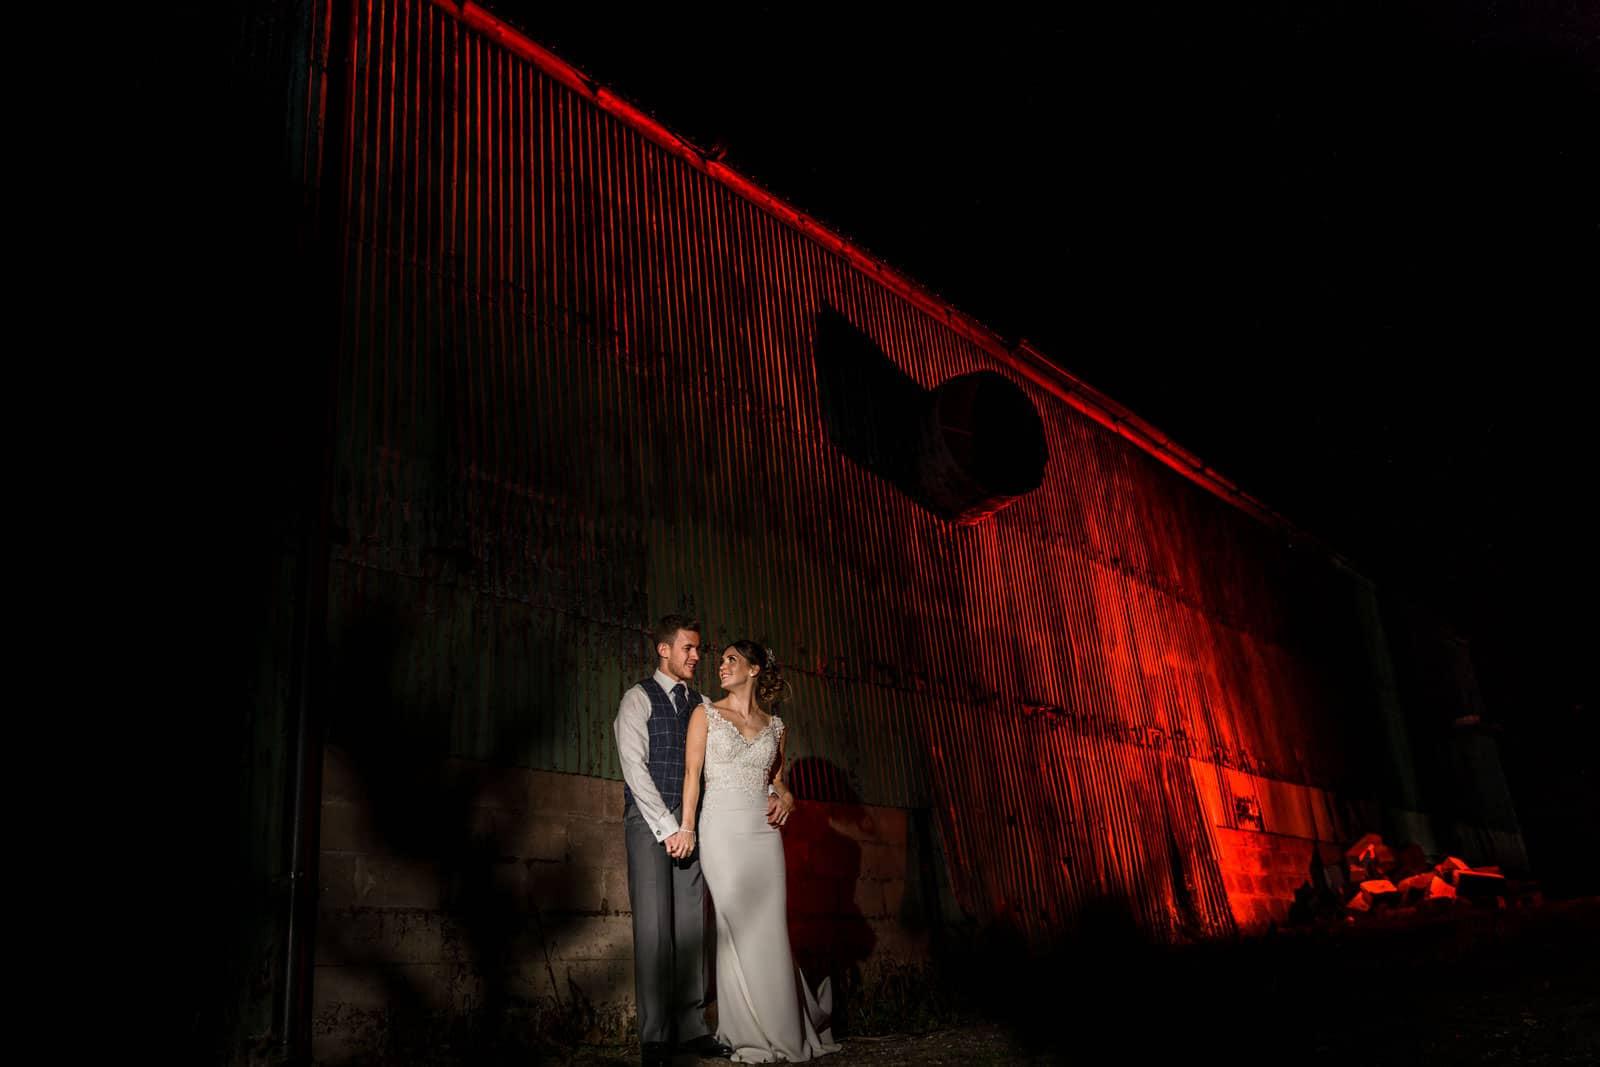 The Reidrooms wedding photography off camera flash of happy couple using magmod